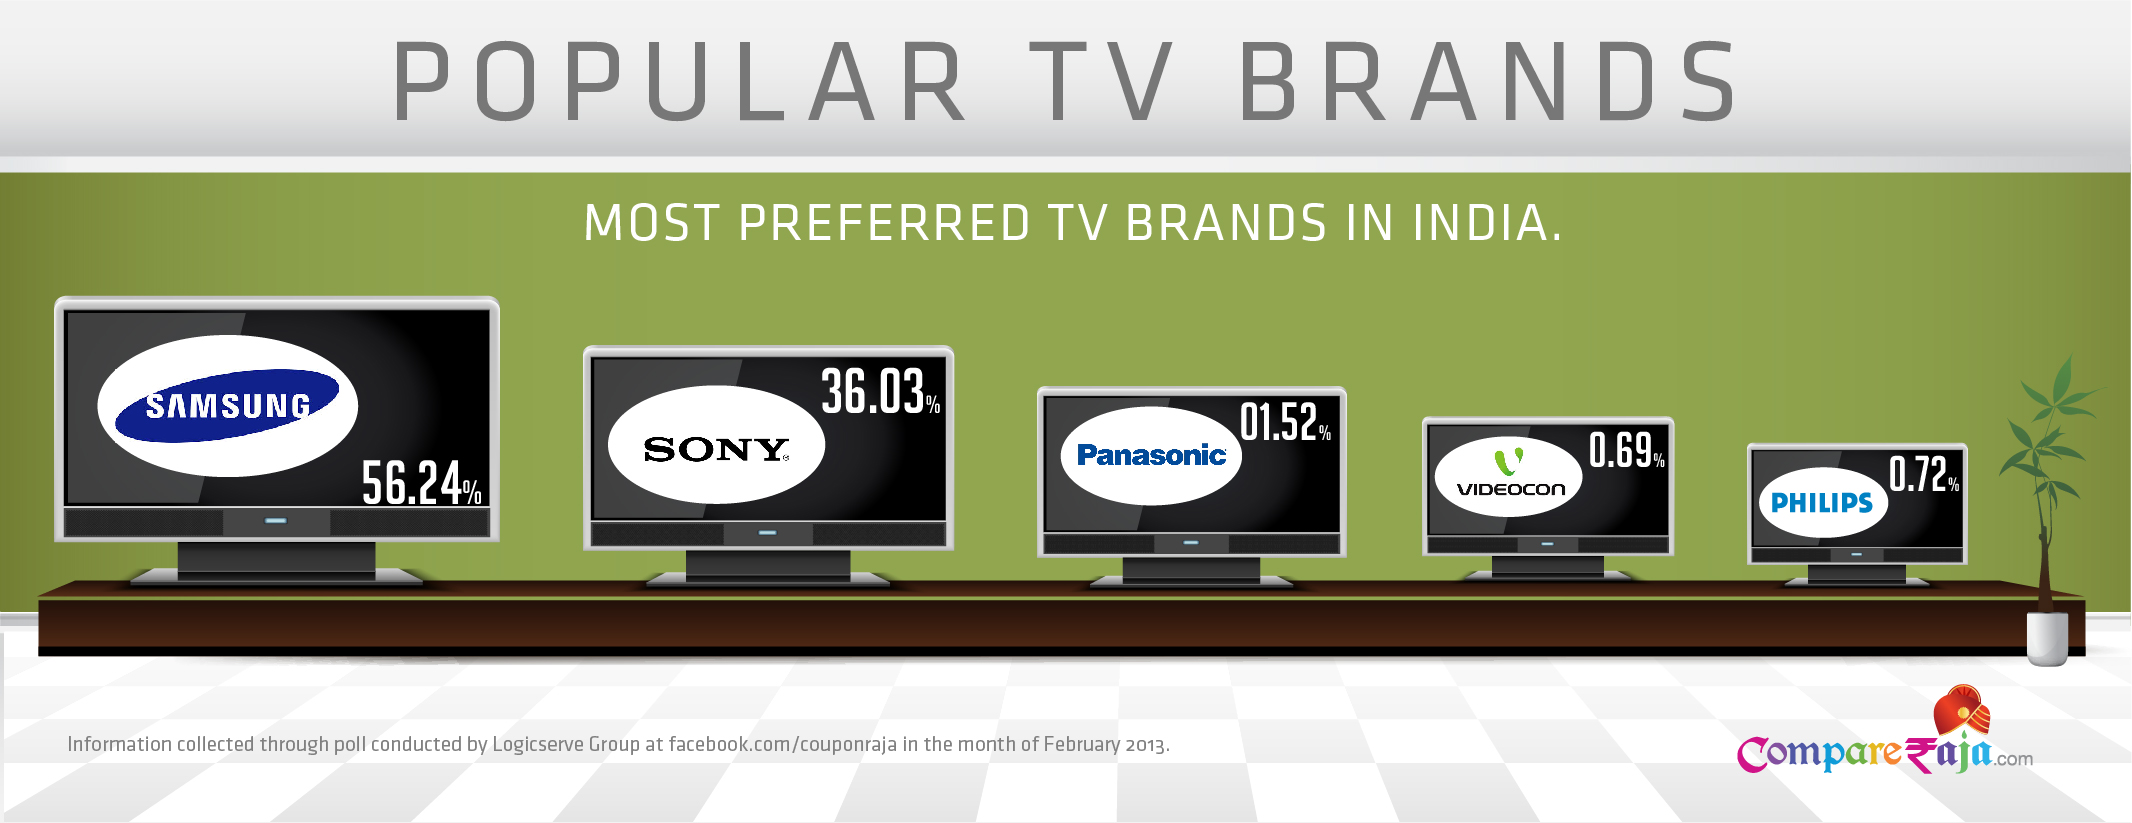 Popular TV Brands